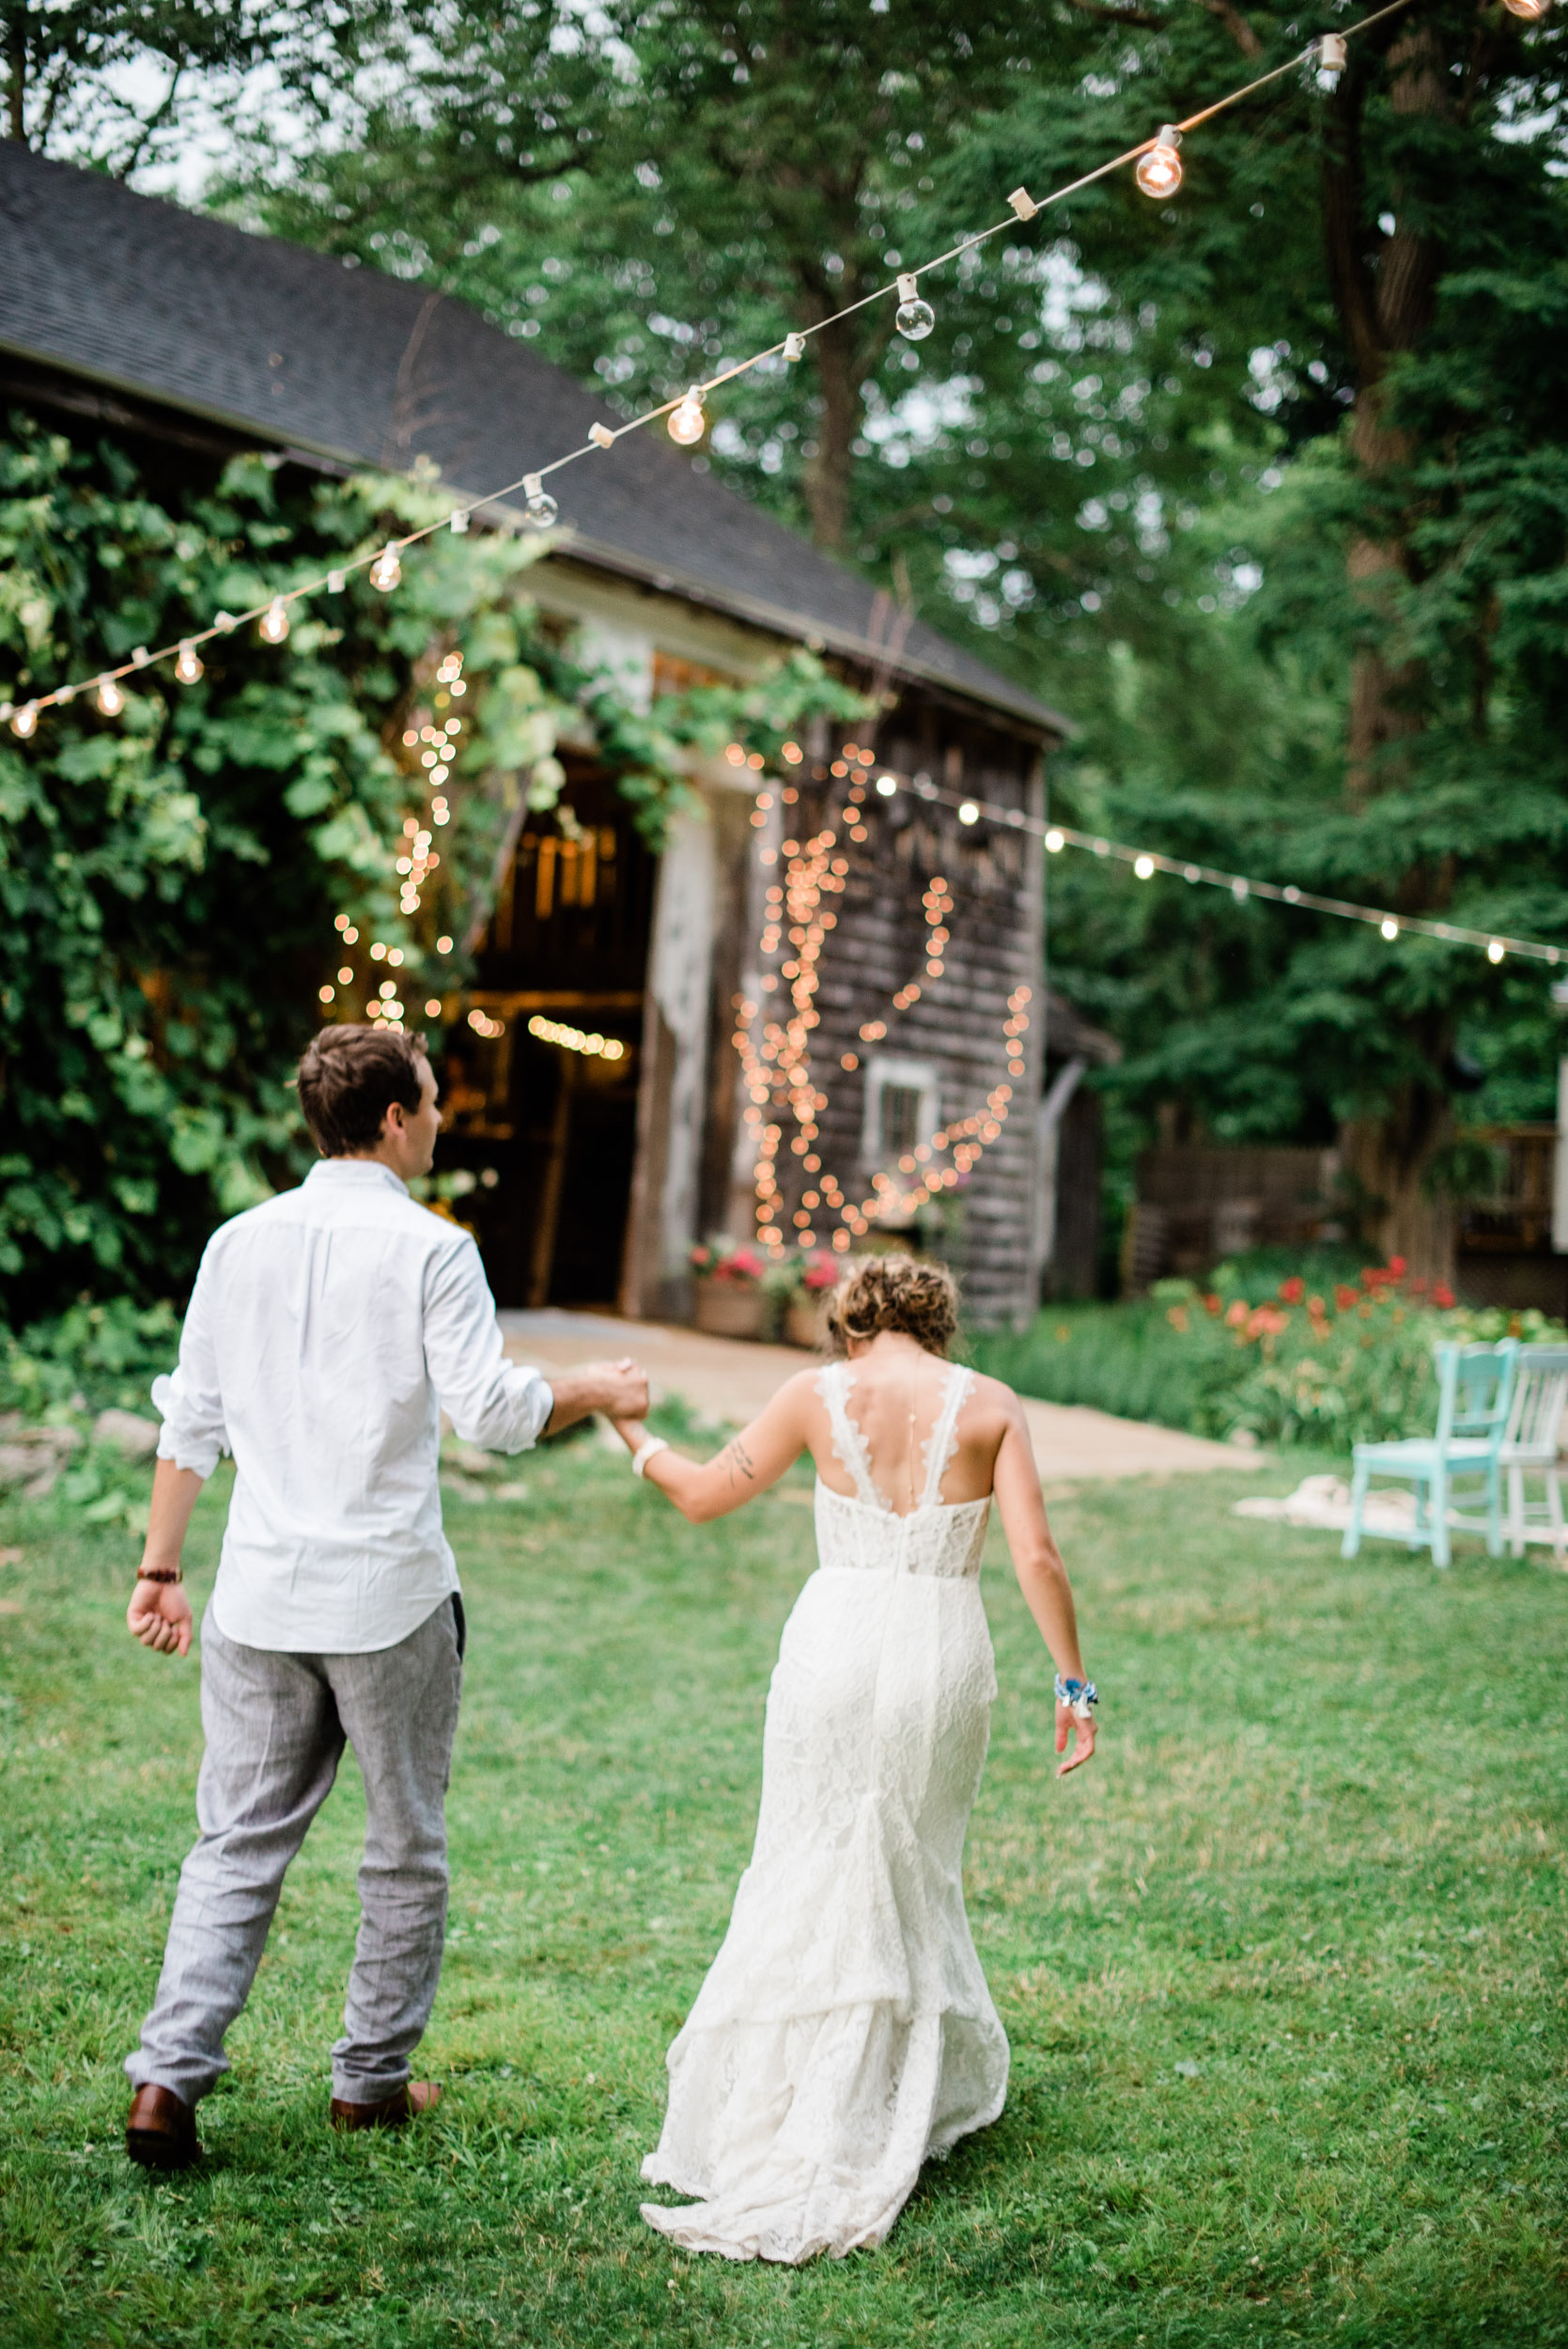 Stockbridge Area Wedding Photographer